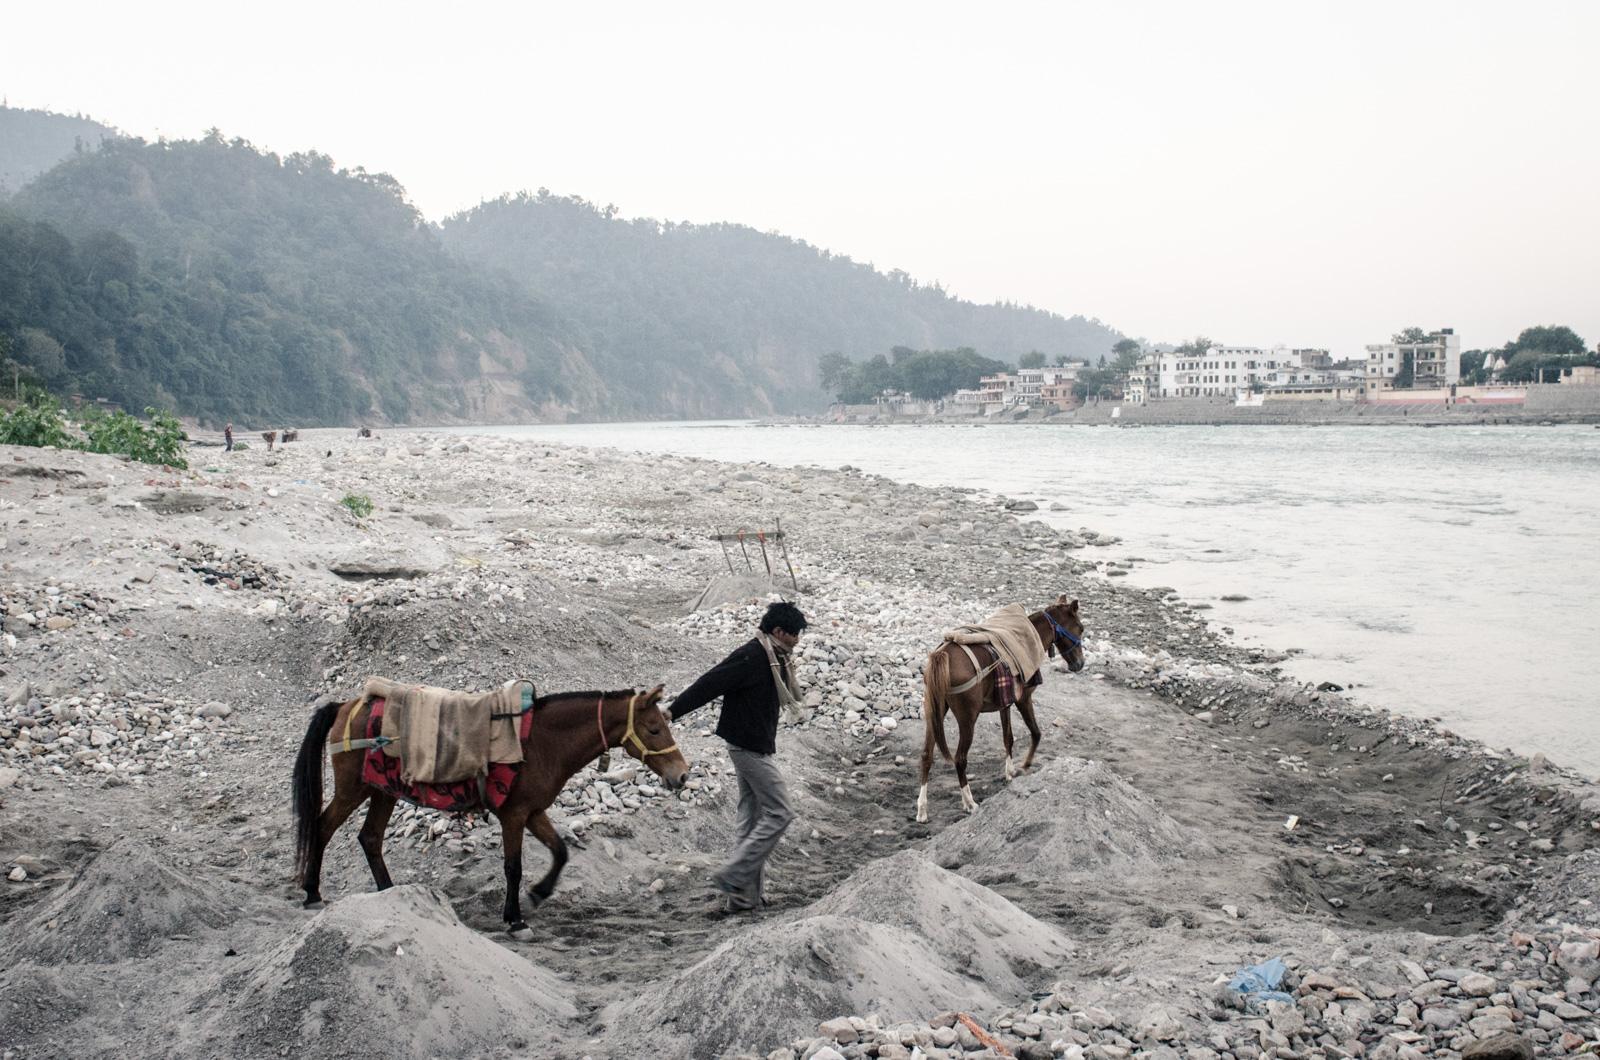 Rishikesh-Uttakarand-India-GangesRiver-AmyRolloPhoto-0500.jpg